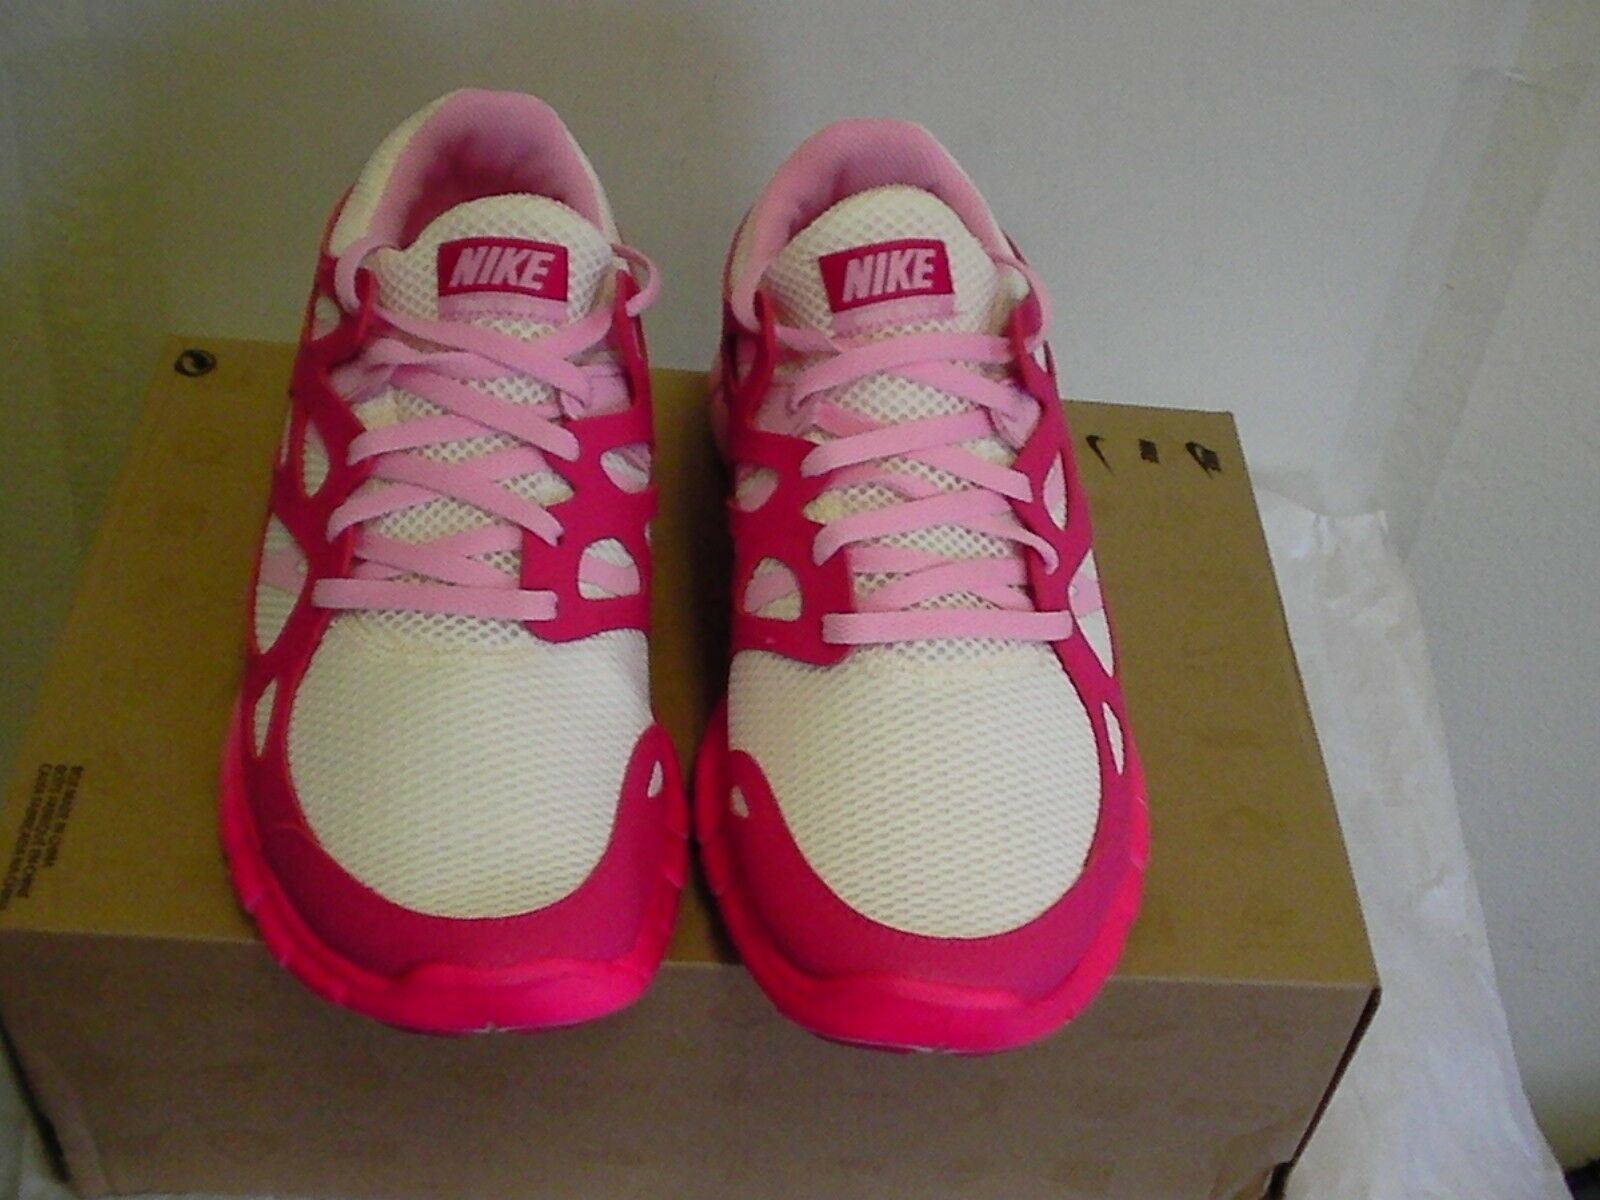 Donna Nike Free Free Free Run 2 Ext Taglia 10  A Nuove senza Scatola 3e9dc7